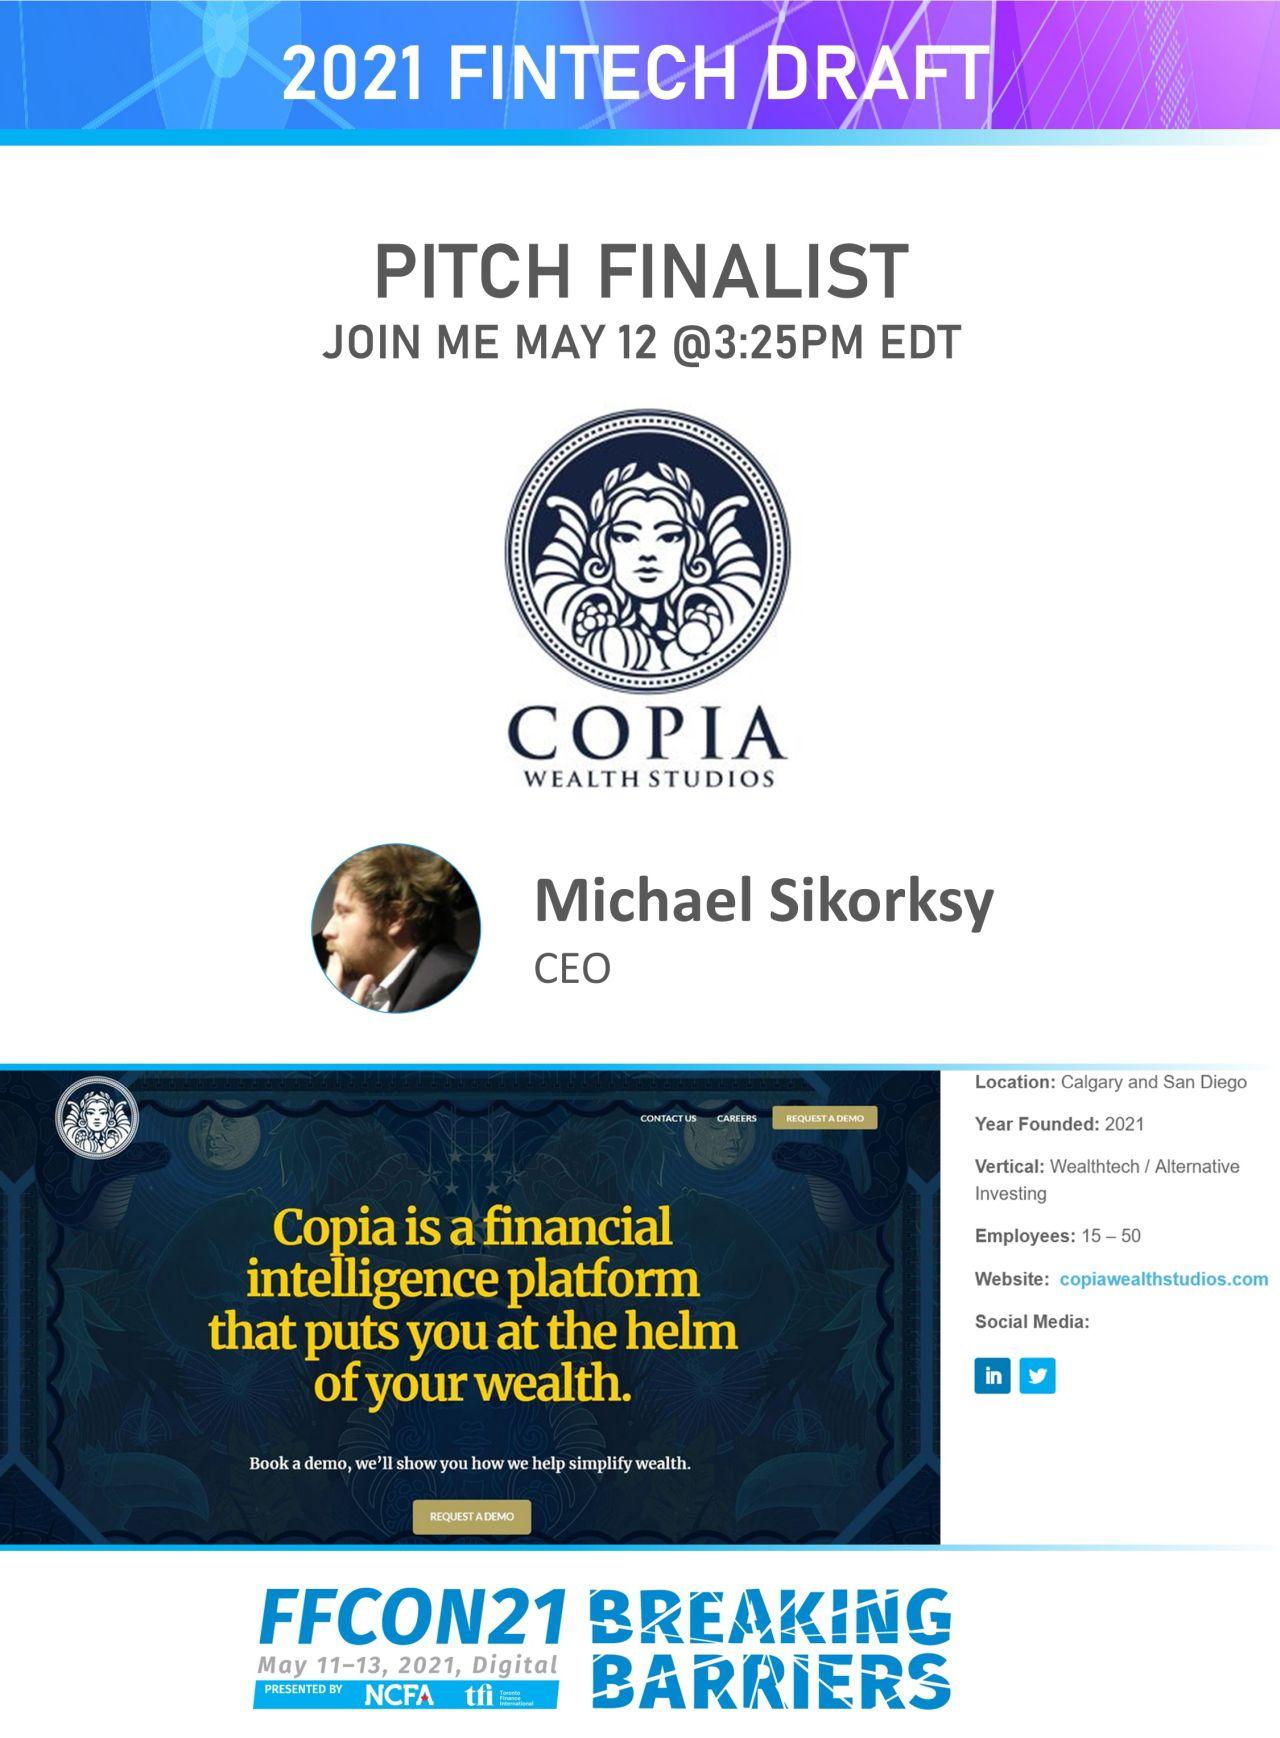 FFCON21 Pitch Finalist Copia Wealth Studios